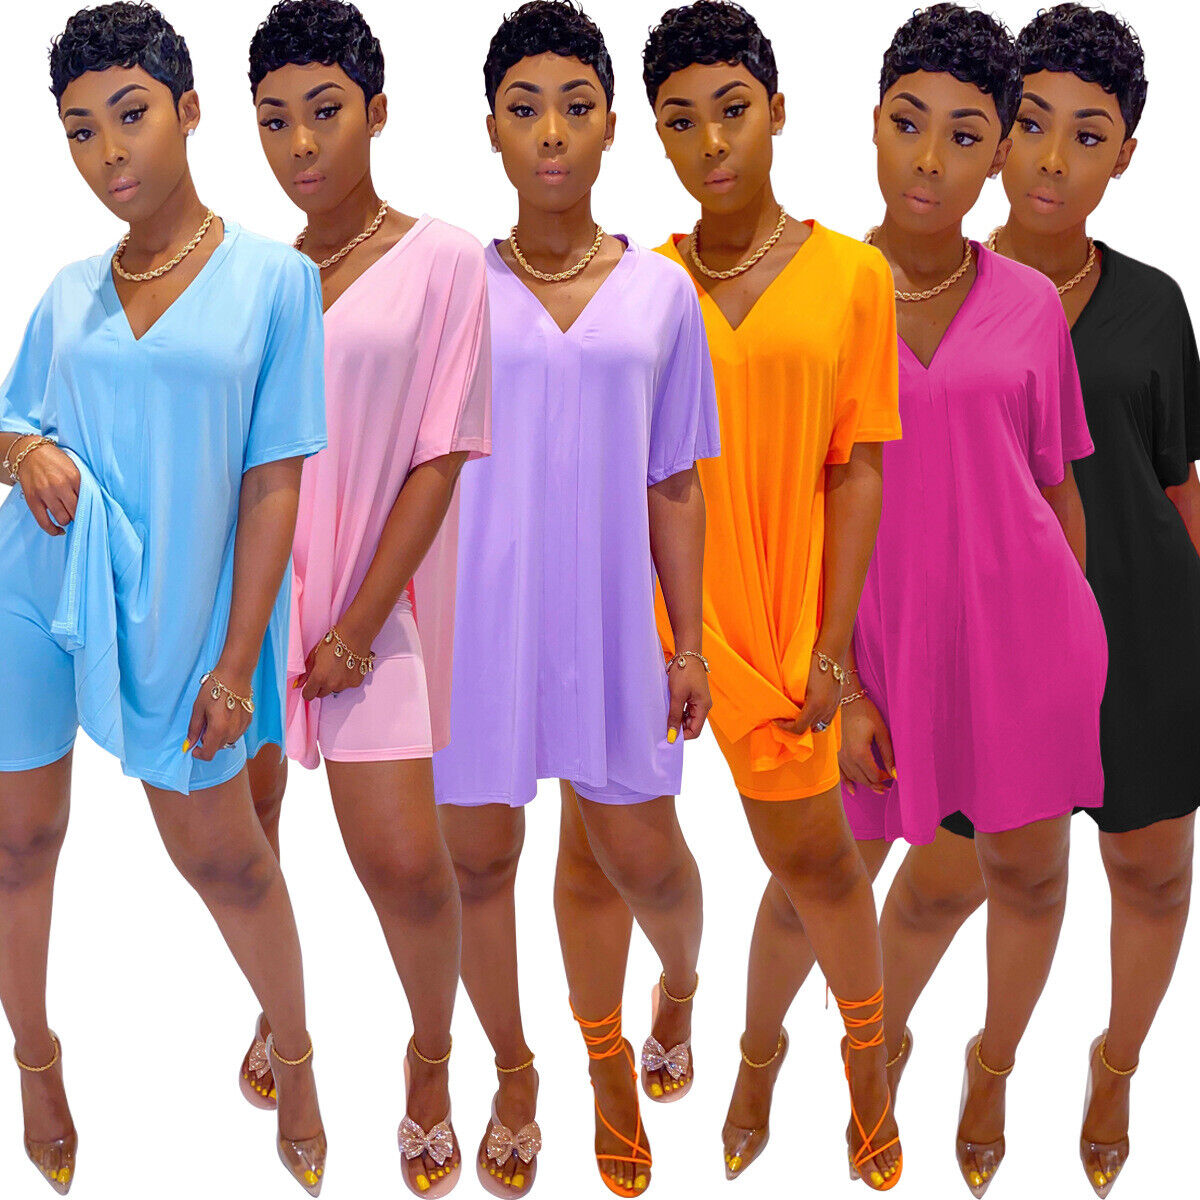 Women Short Sleeves V Neck Stripes Casual Club Party Side Slit Loose Long Dress